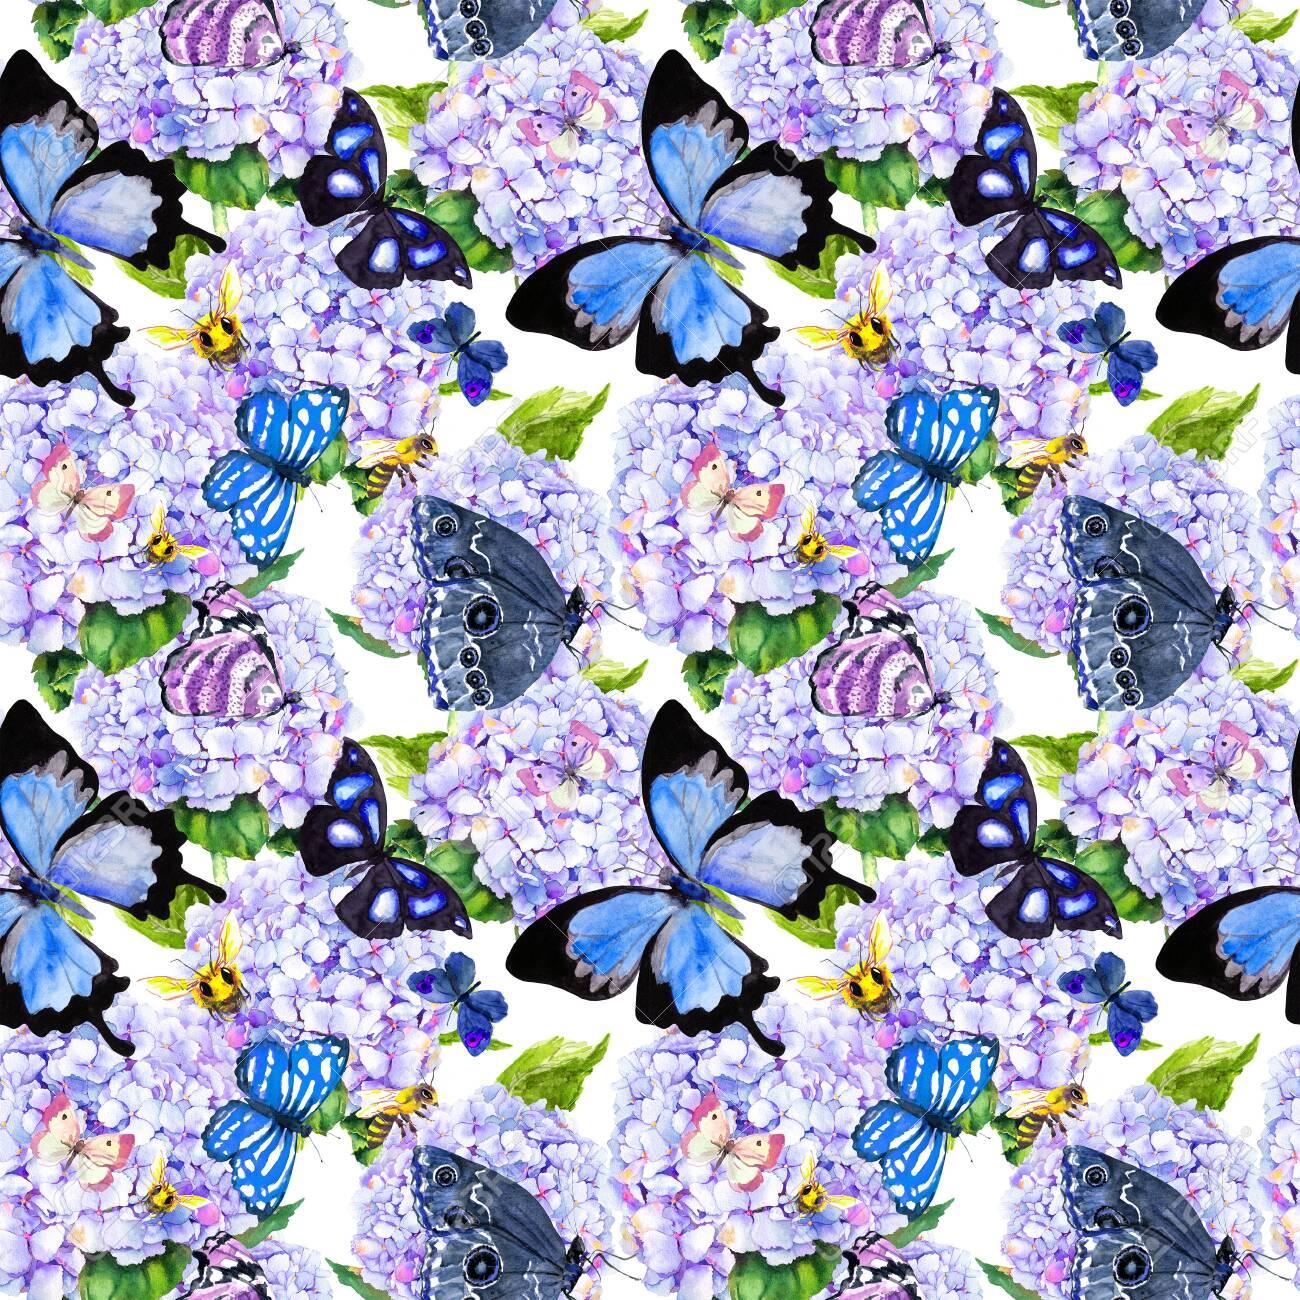 Blue hydrangea flowers, butterflies, bees. Seamless floral pattern. Watercolor. - 135383679